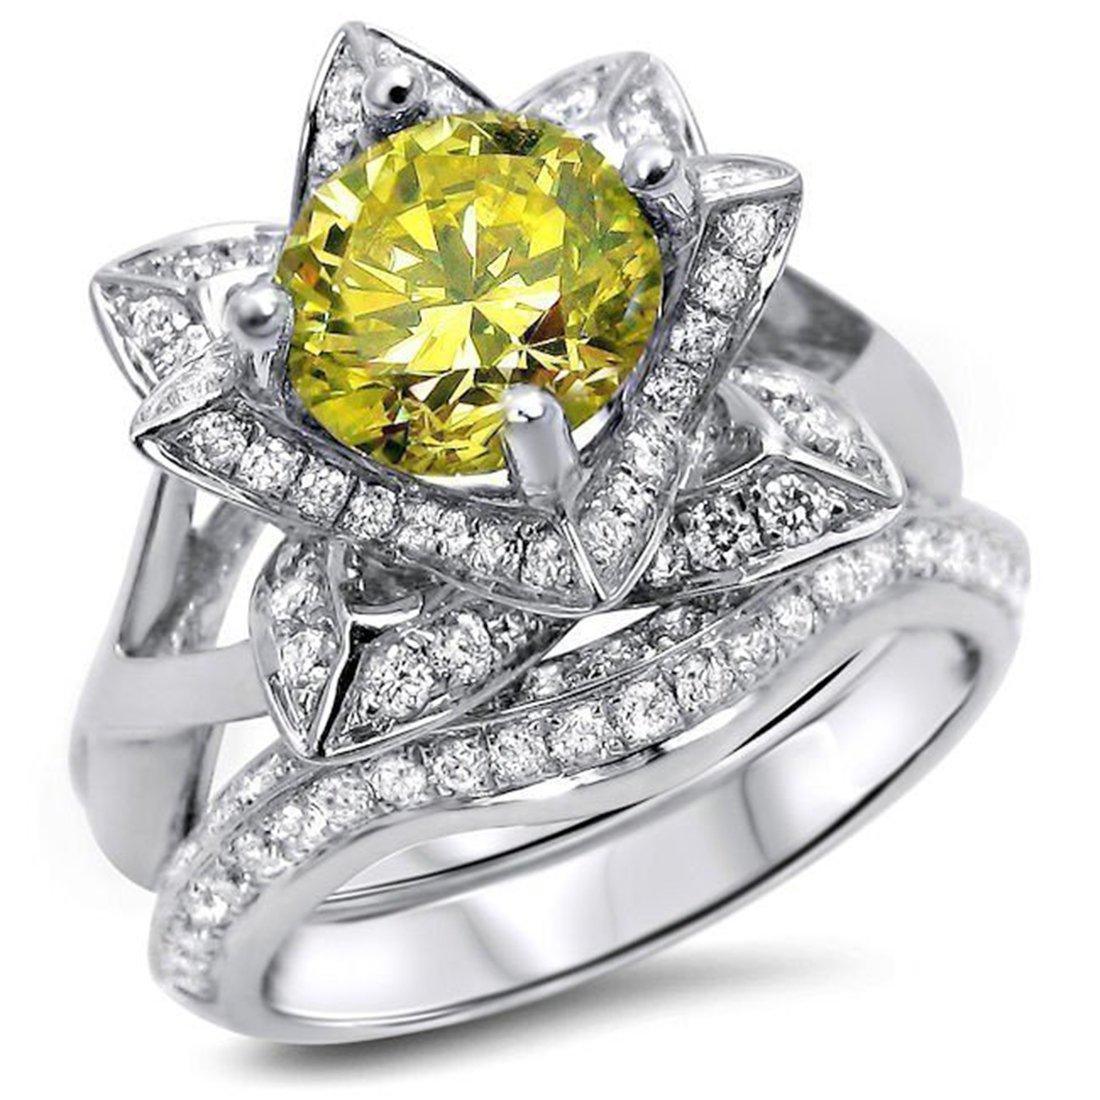 Smjewels 2.00 Ct Yellow Round Sim.Diamond Lotus Flower Engagement Ring Set 14K White Gold Fn